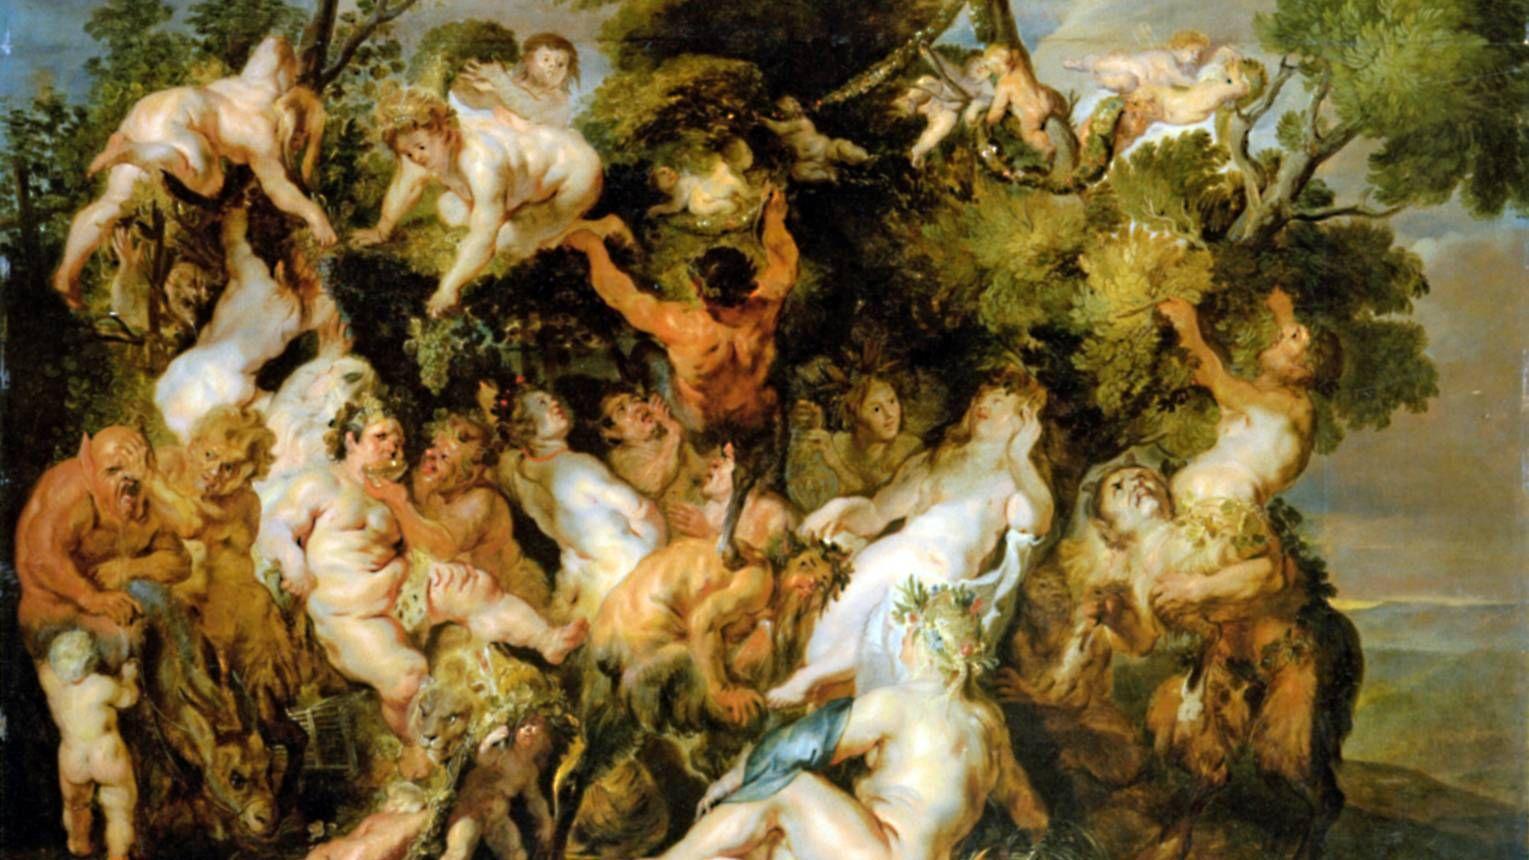 Йорданс Якоб. Вакханалия. 17 век